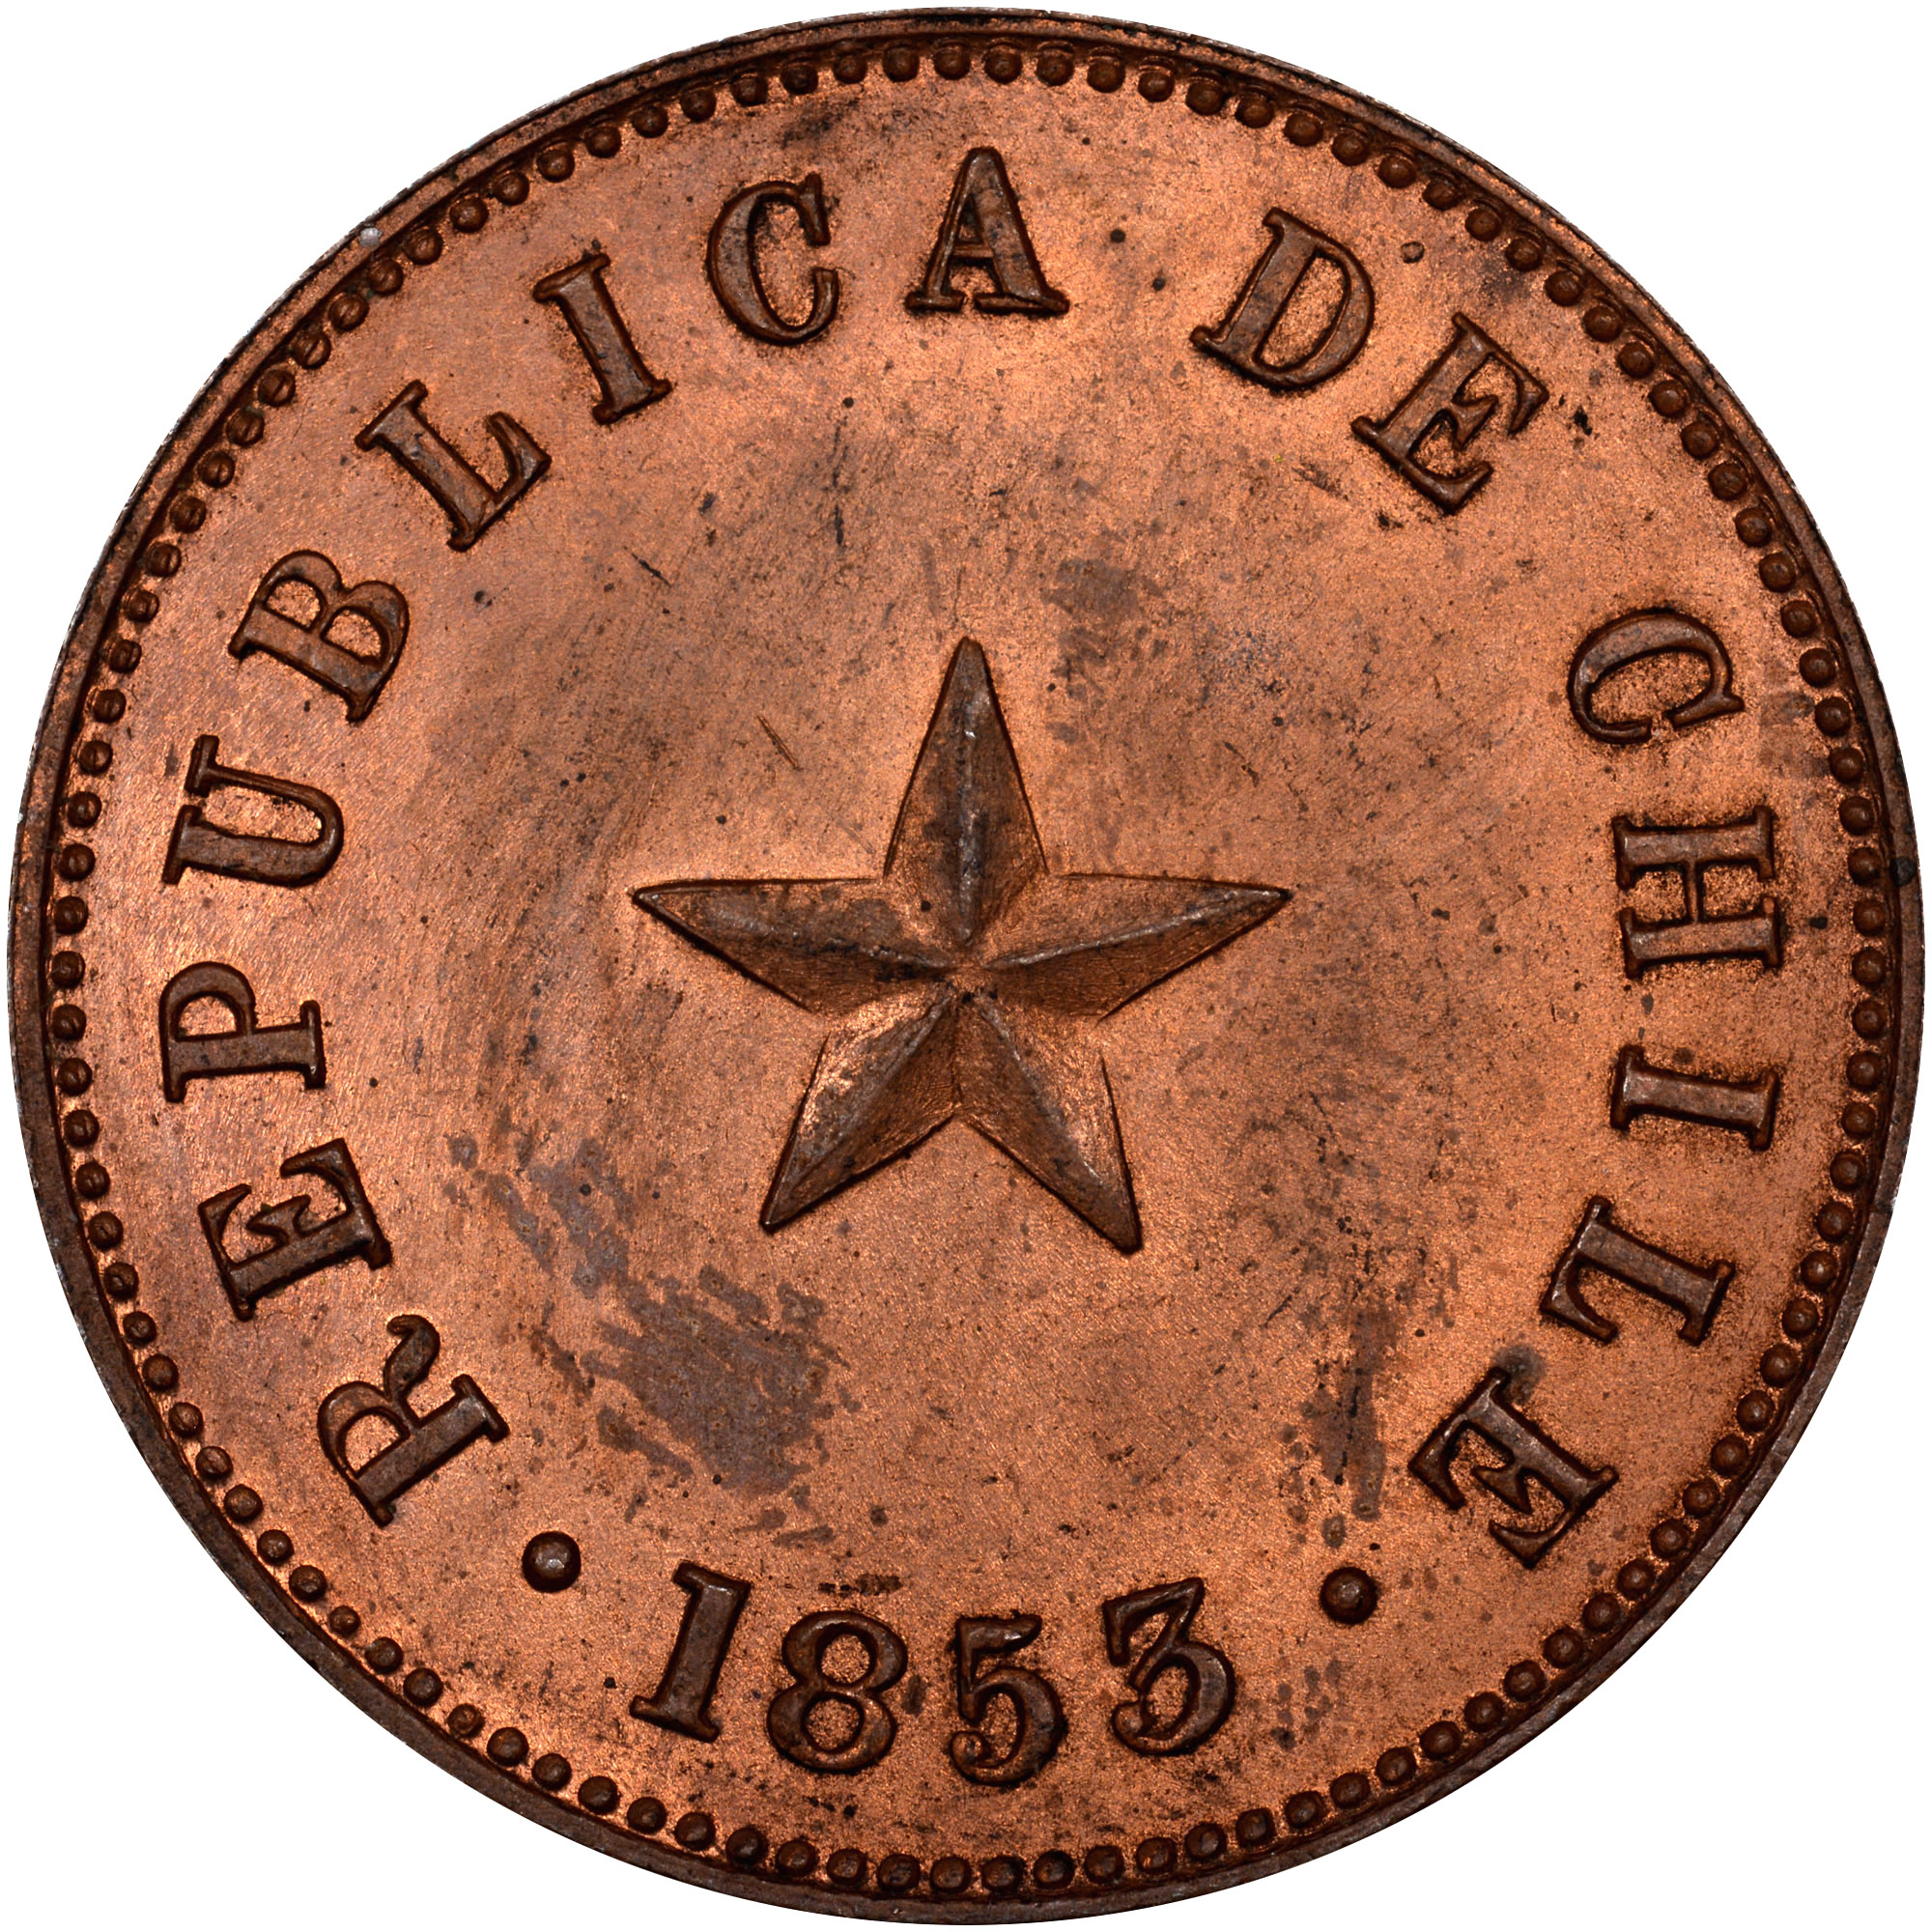 1853 Chile 1/2 Centavo obverse